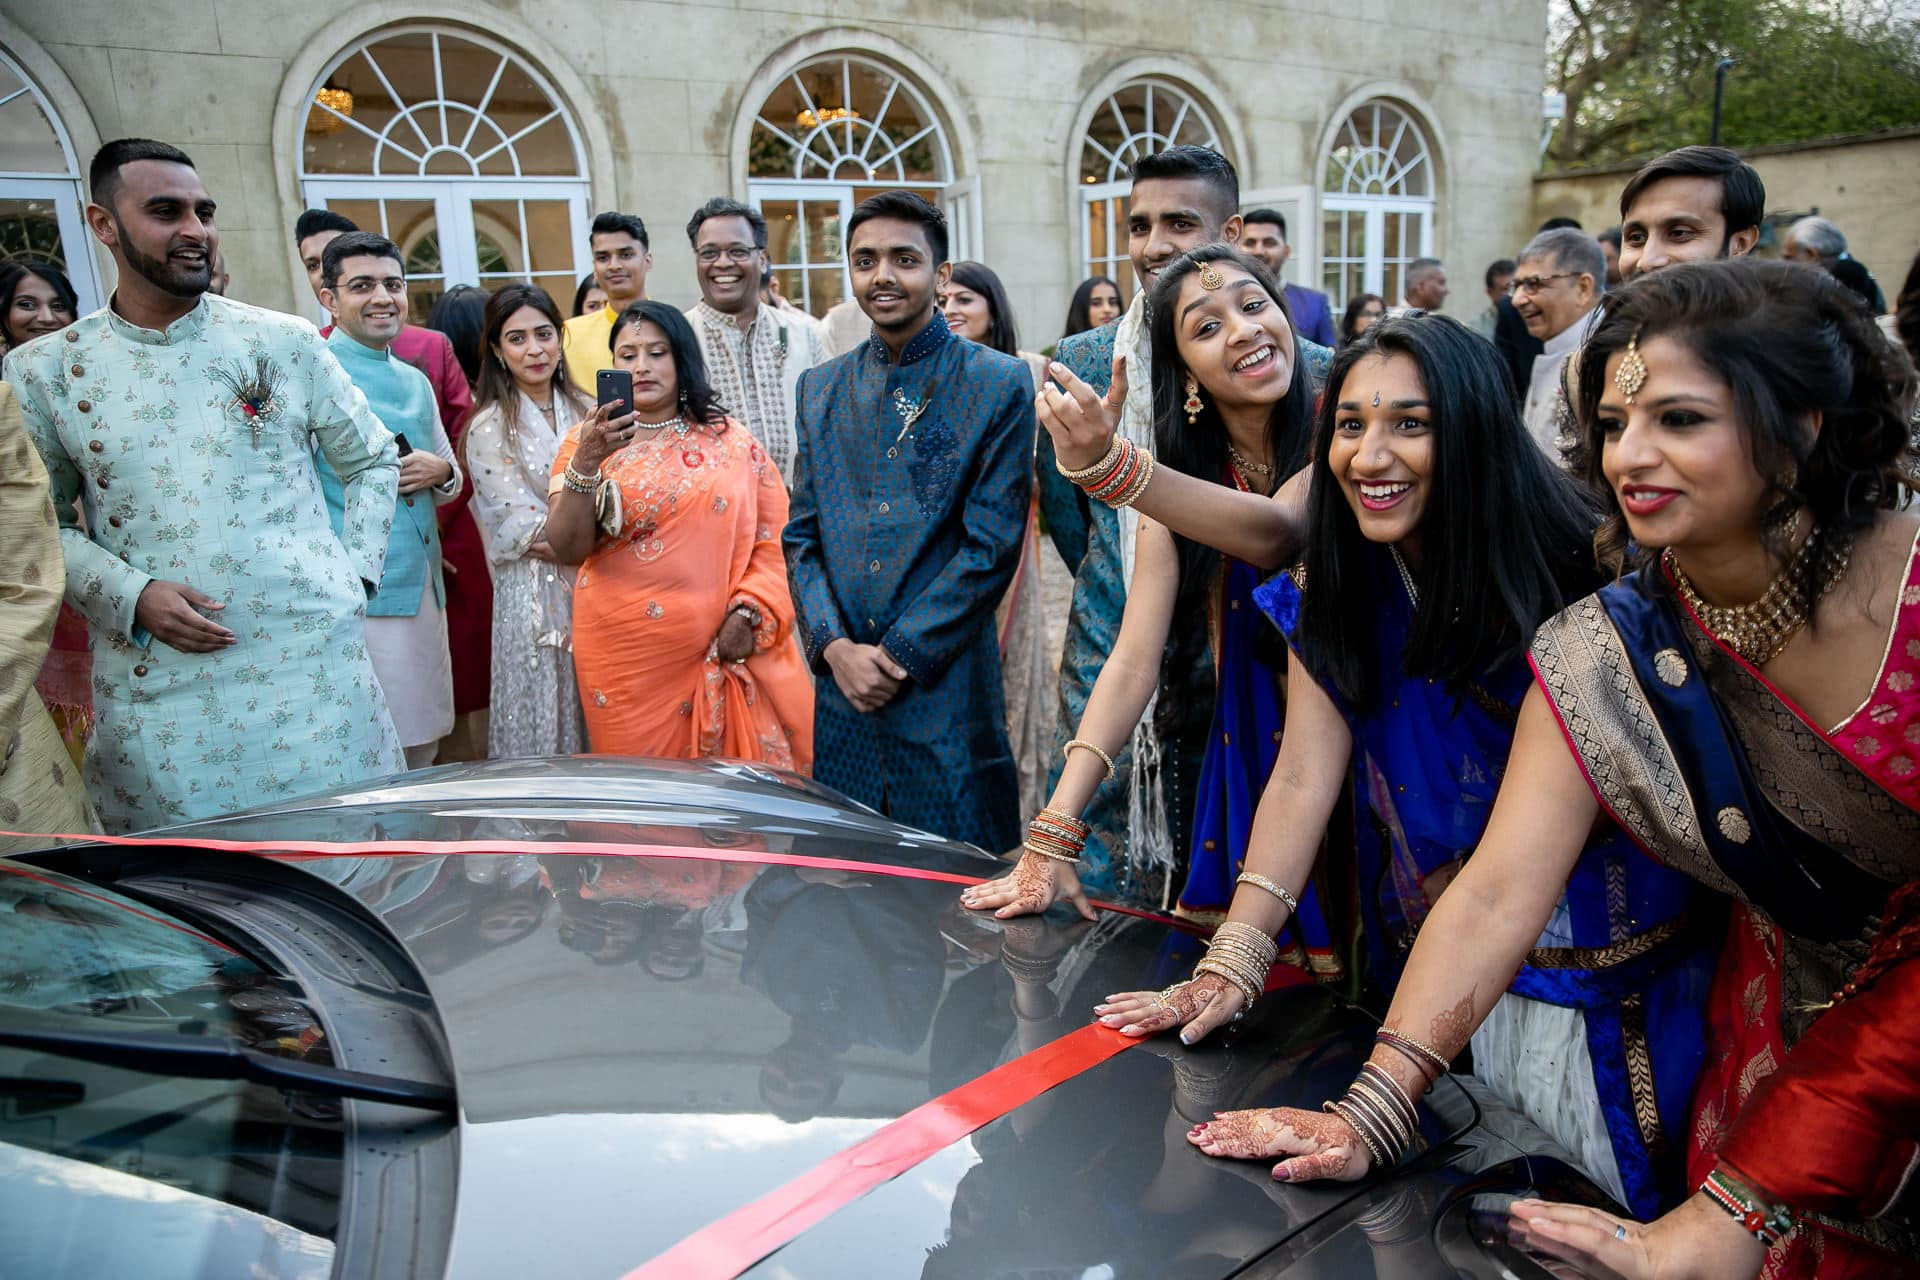 Vidhai, Hindu wedding leaving ceremony